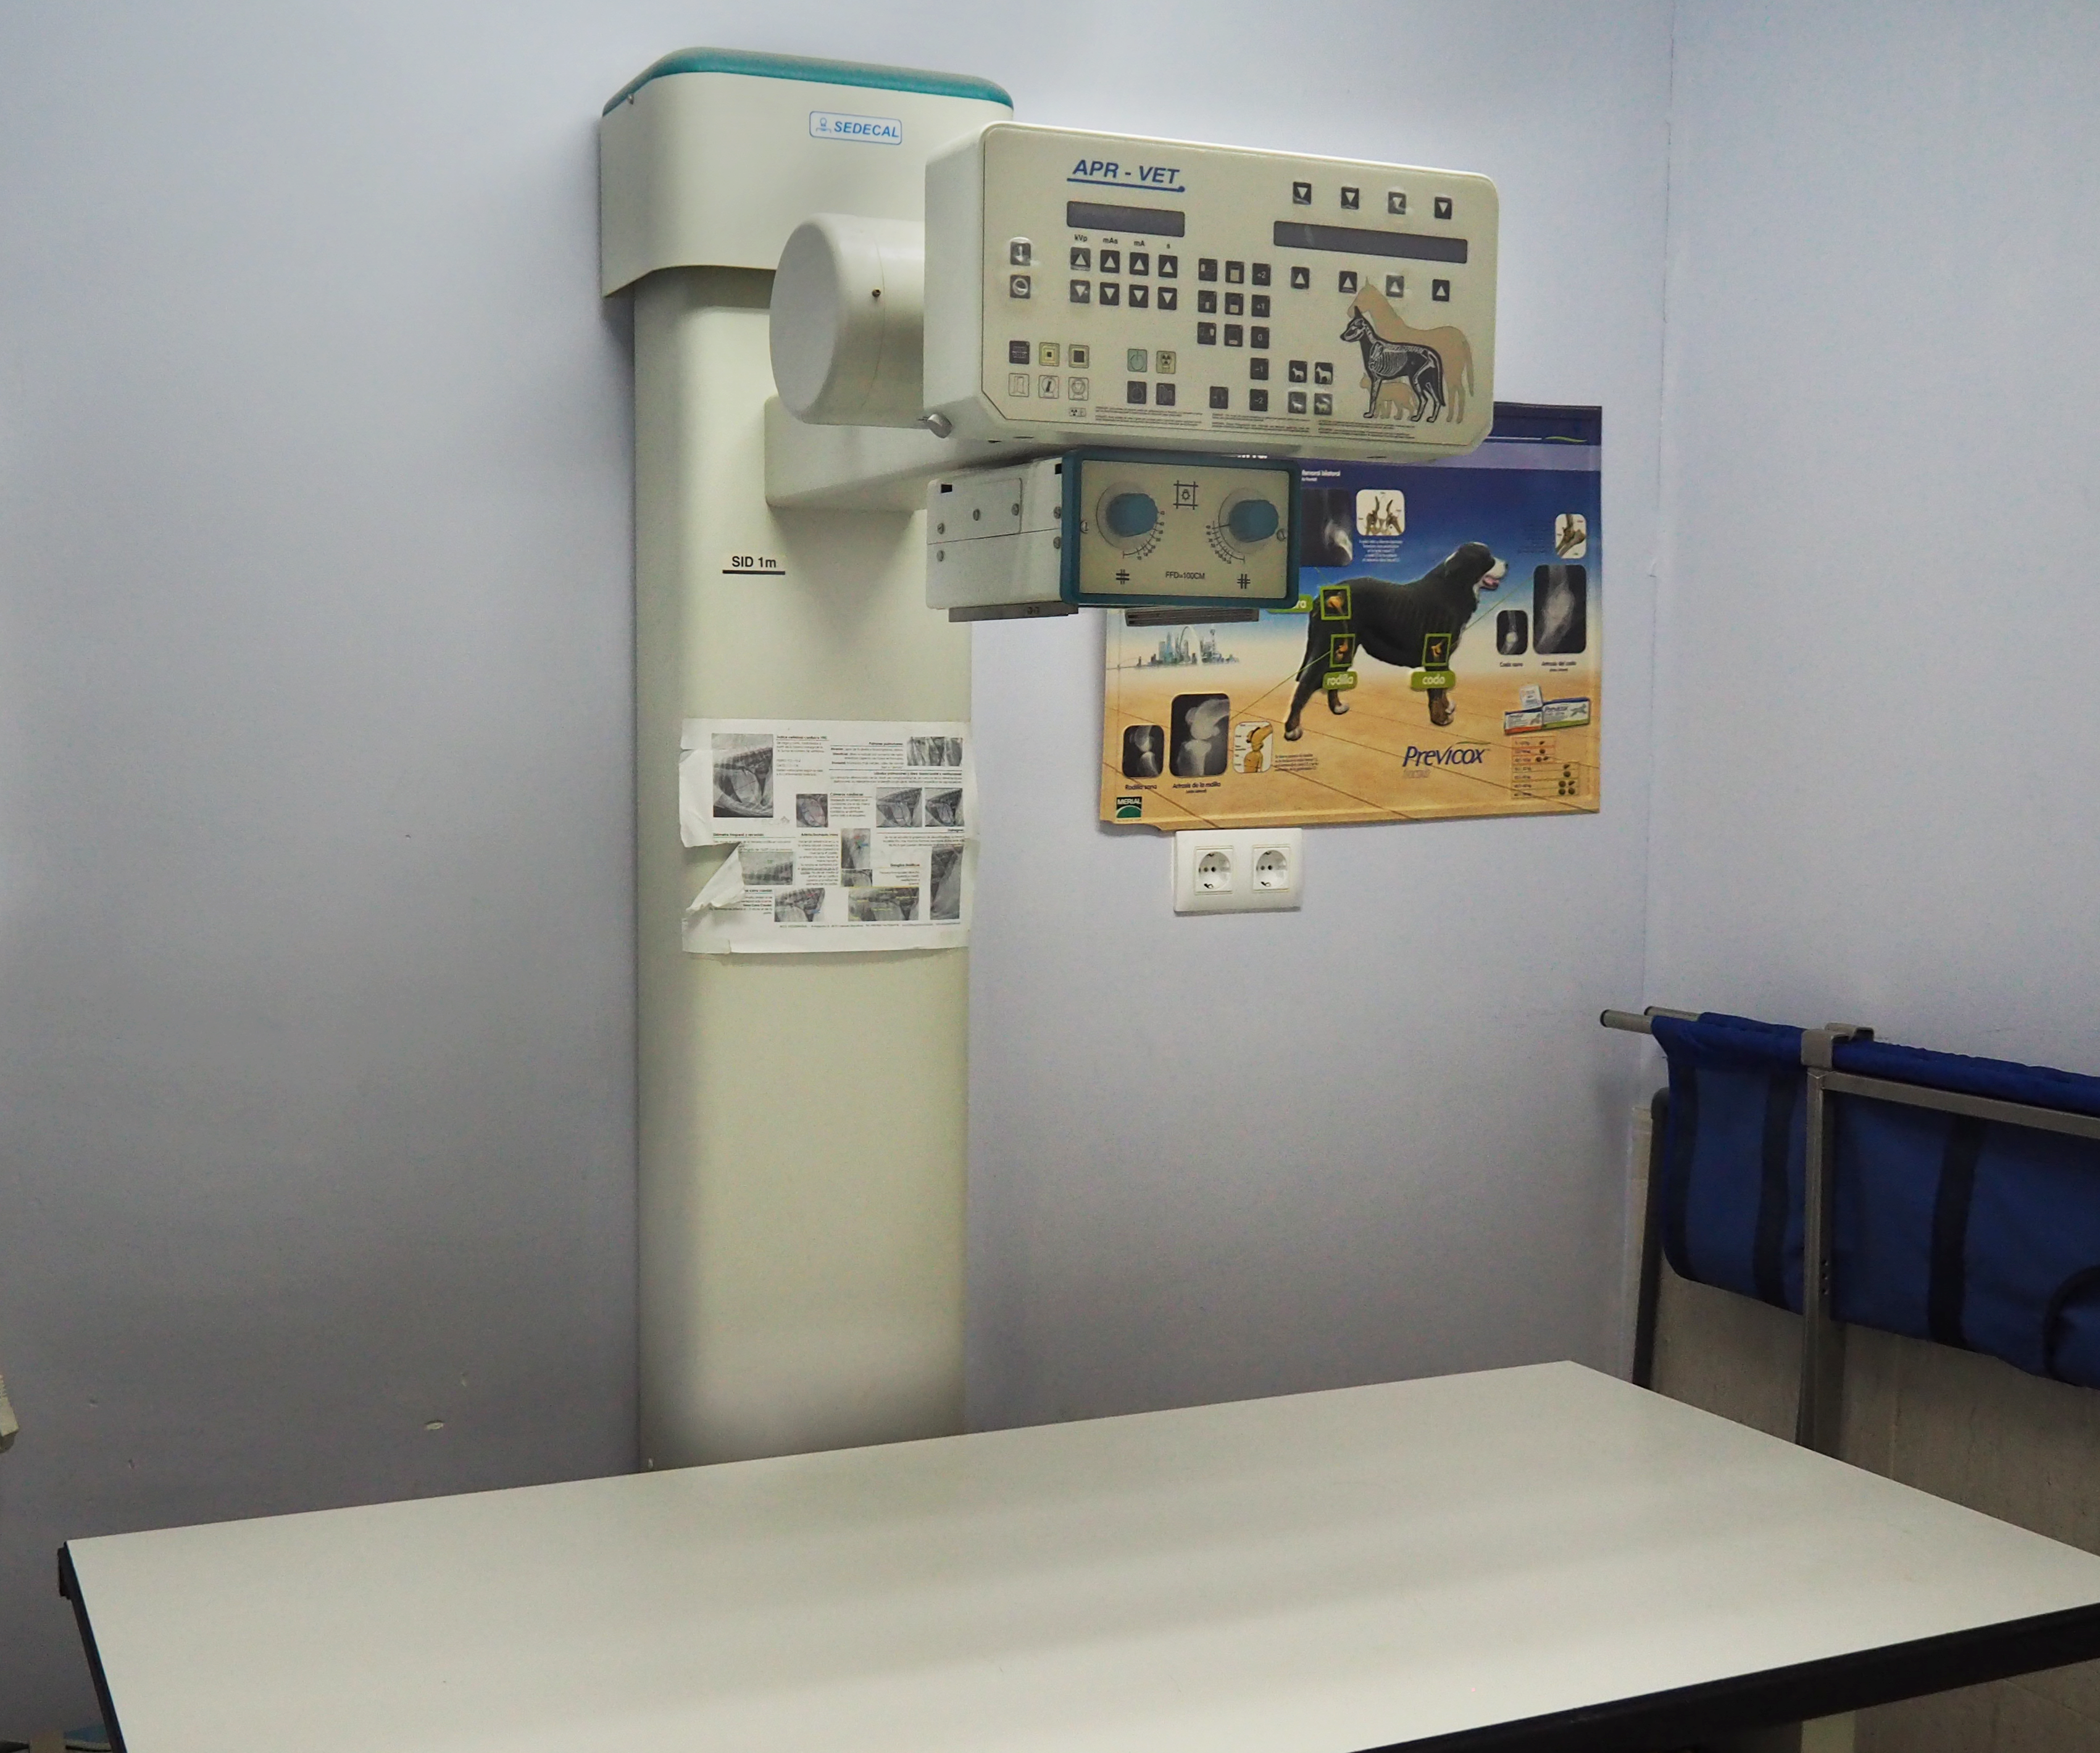 Escaner-de-resonancia-magnetica